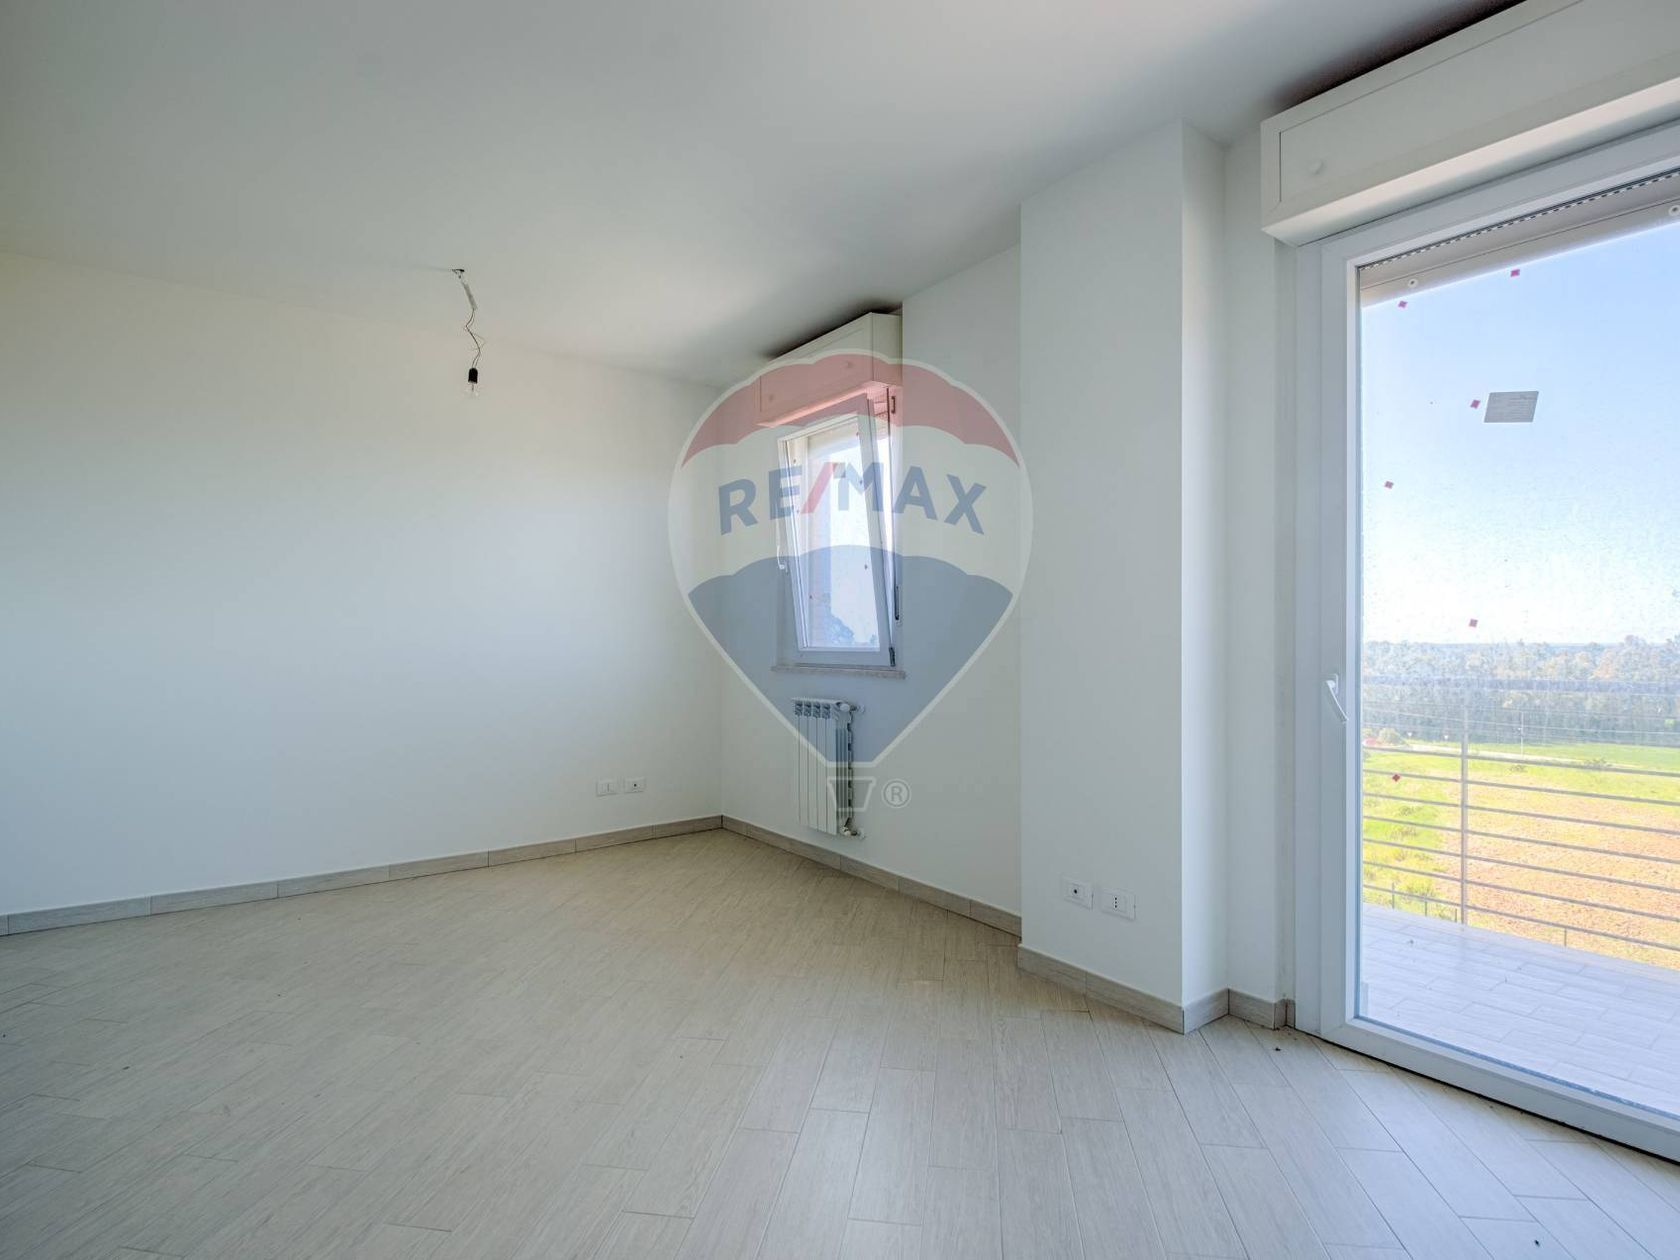 Appartamento Ara Nova, Fiumicino, RM Vendita - Foto 10